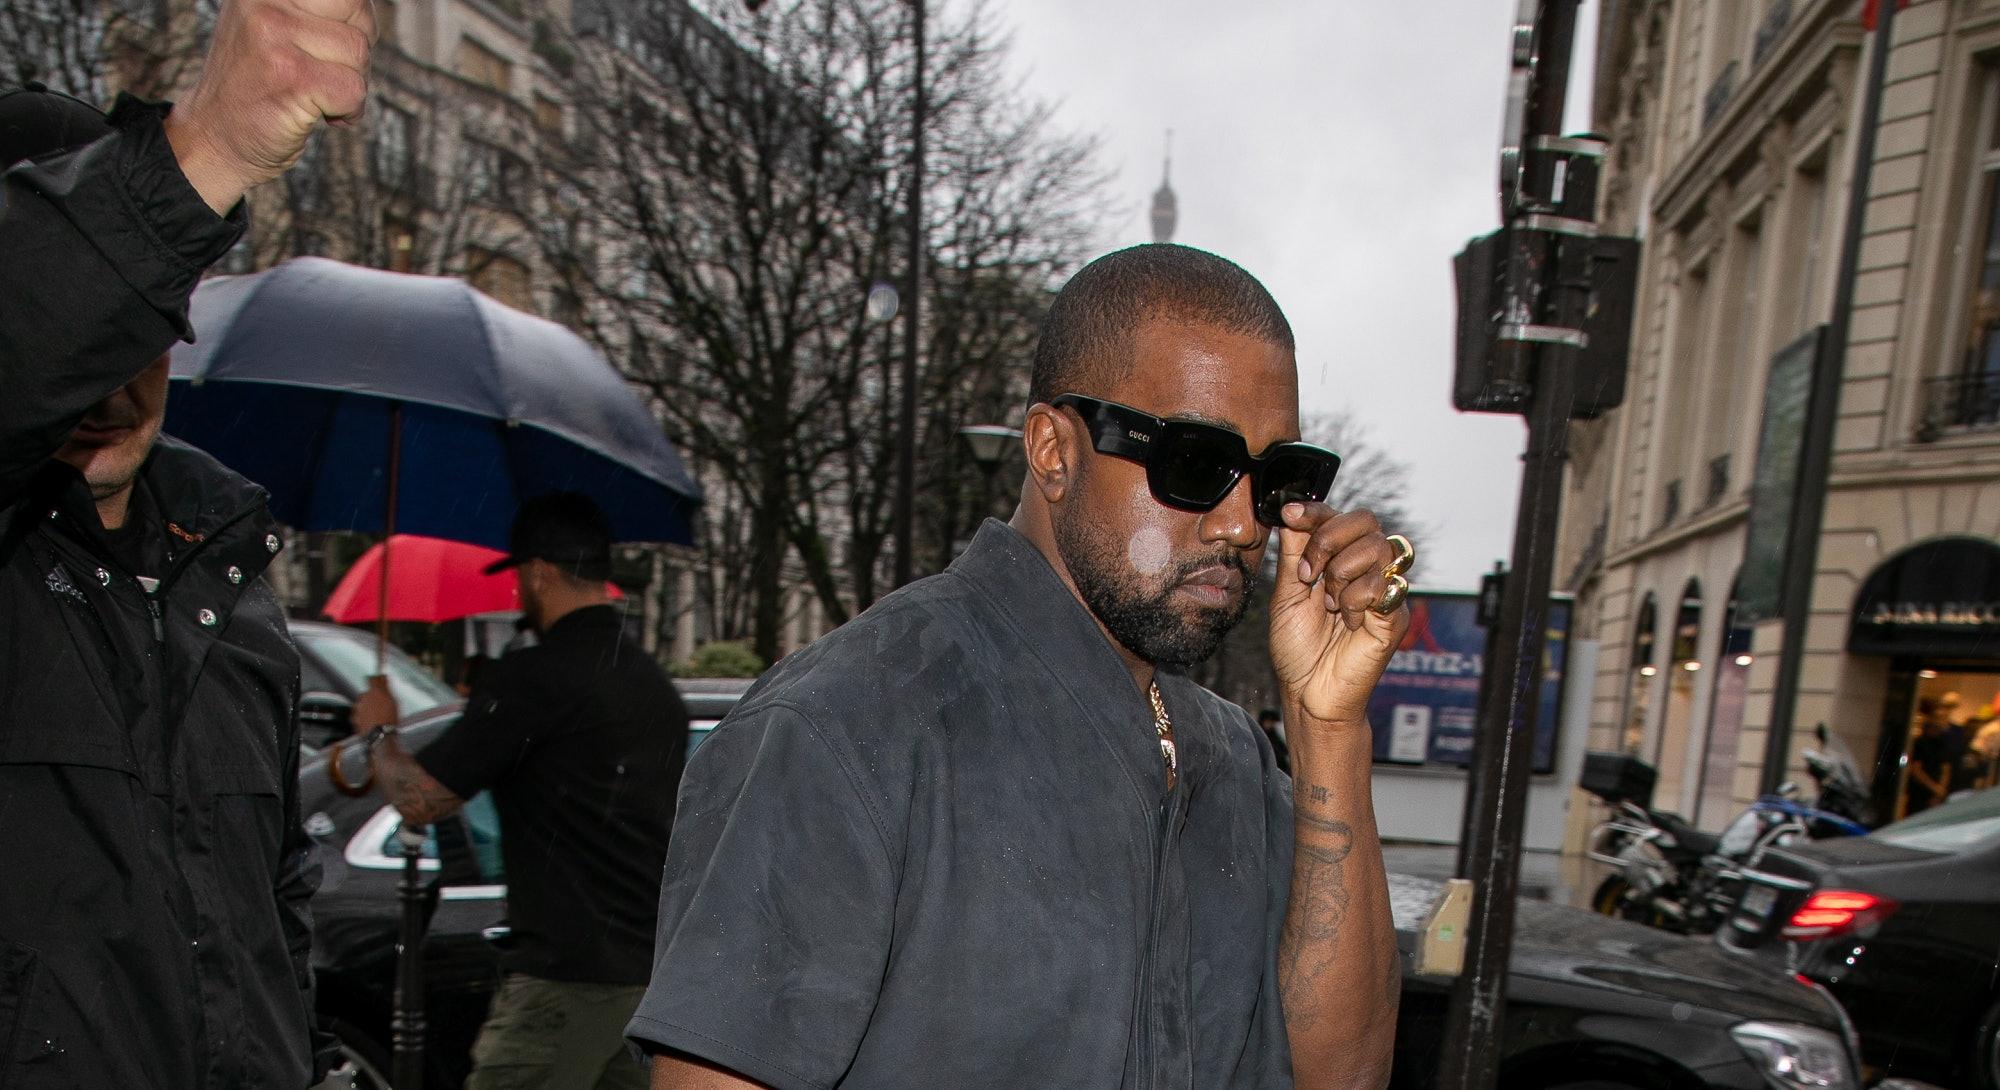 PARIS, FRANCE - MARCH 01: Kanye West arrives at L'Avenue restaurant on March 01, 2020 in Paris, France. (Photo by Marc Piasecki/GC Images)